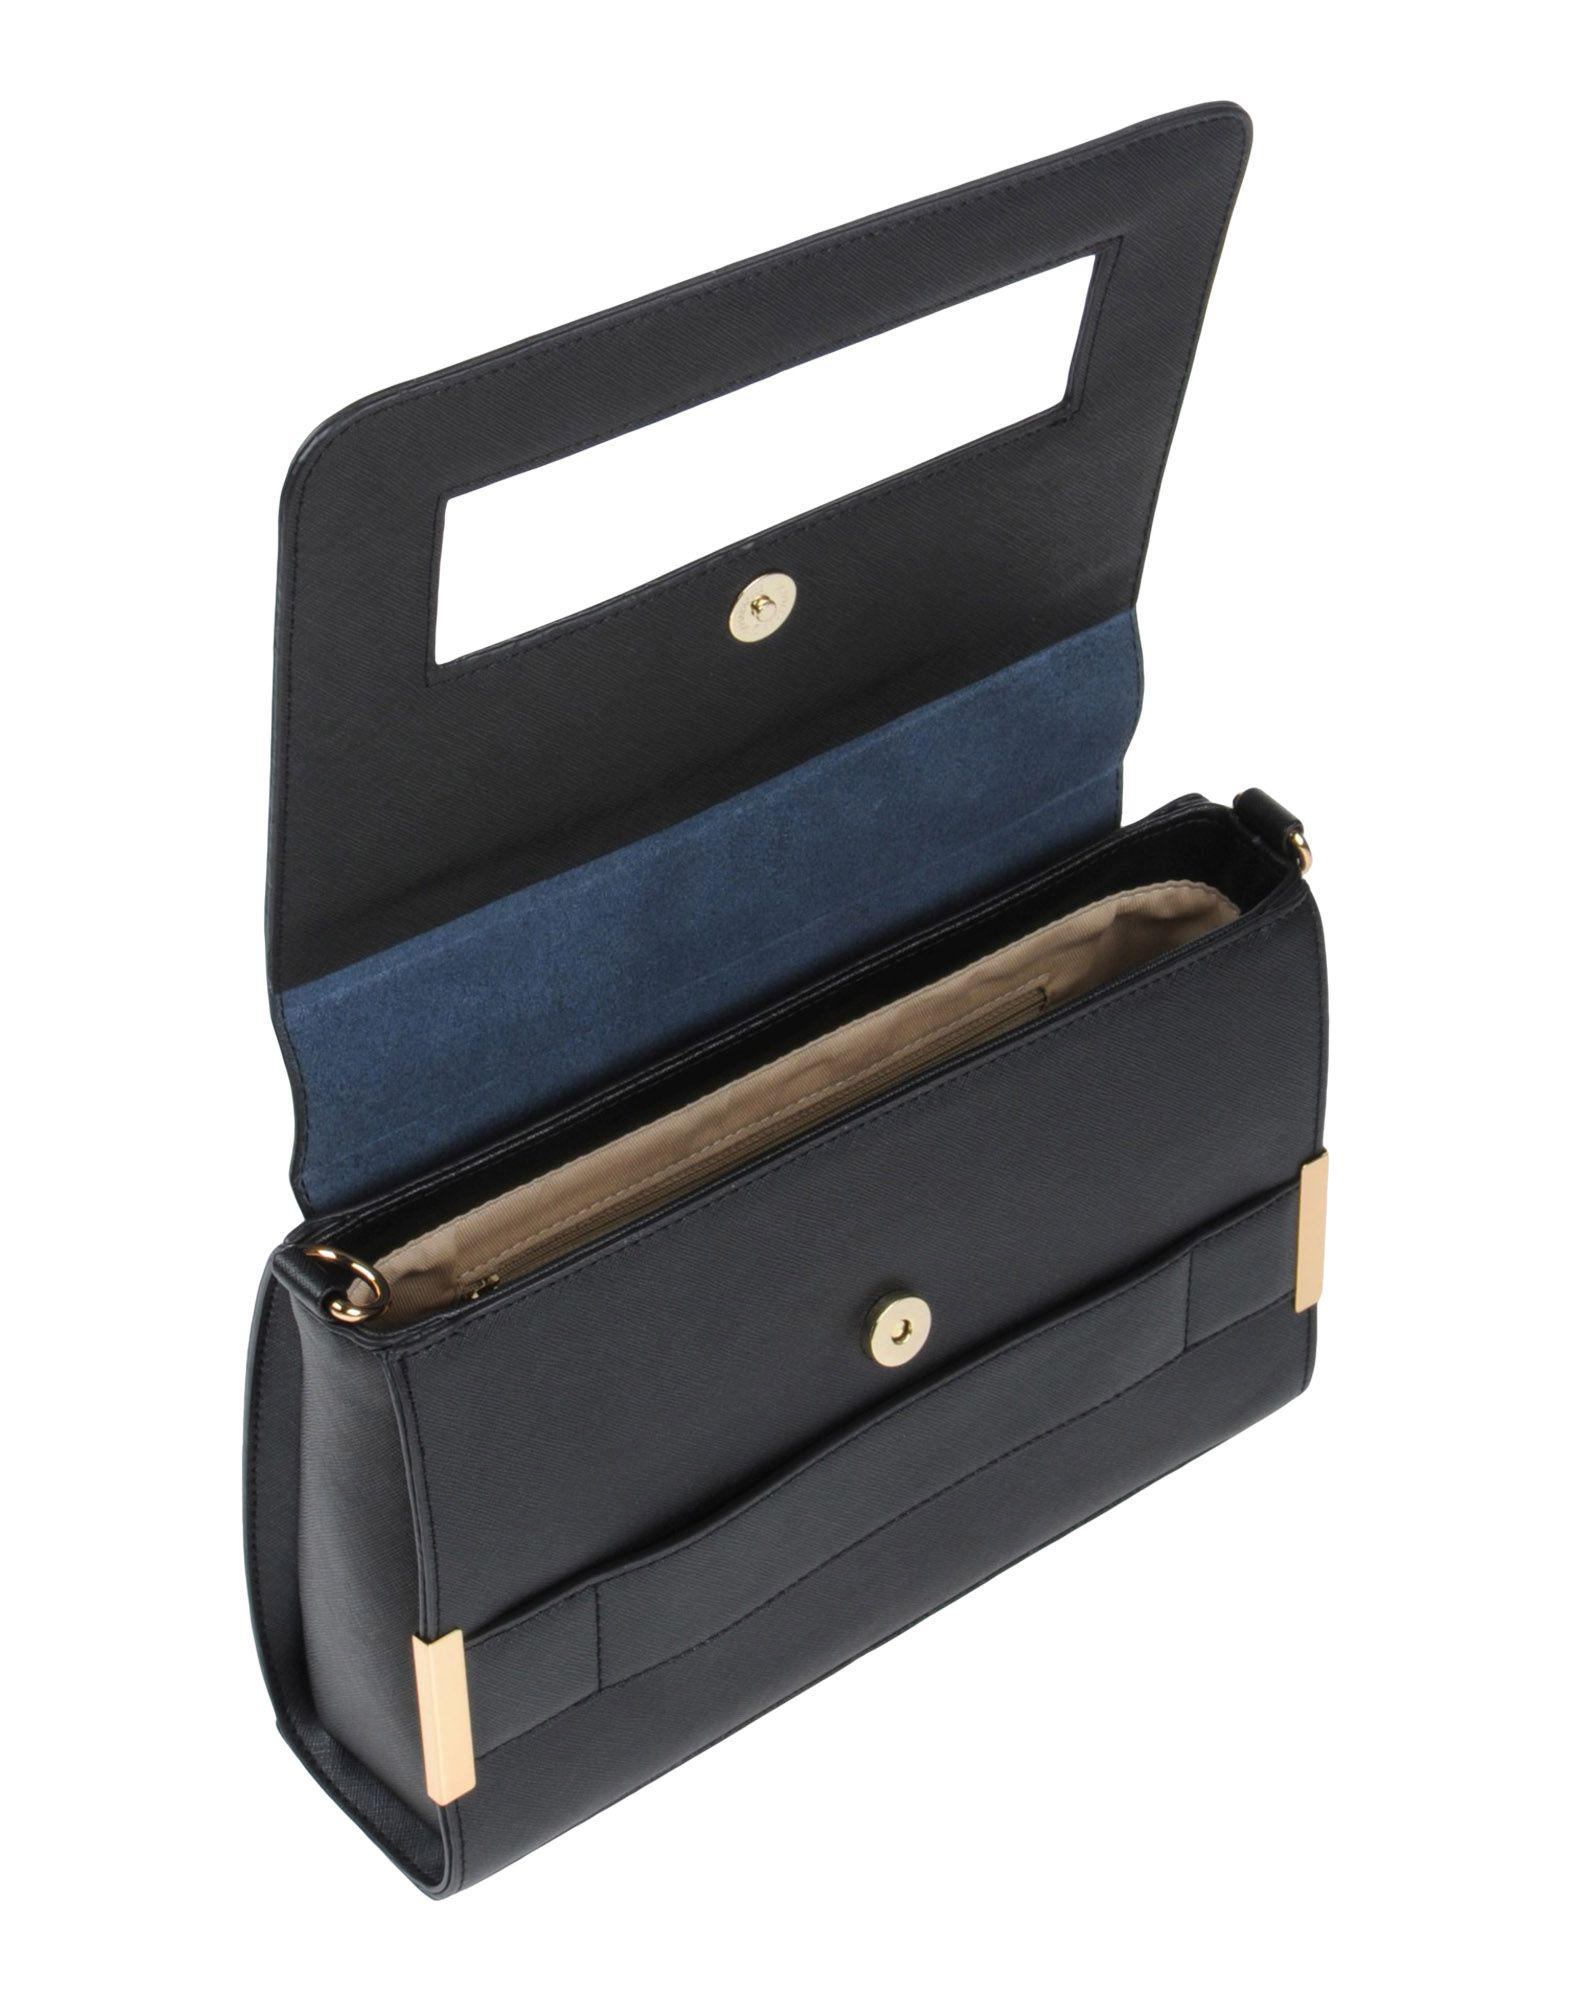 Stefanel Leather Cross-body Bag in Black